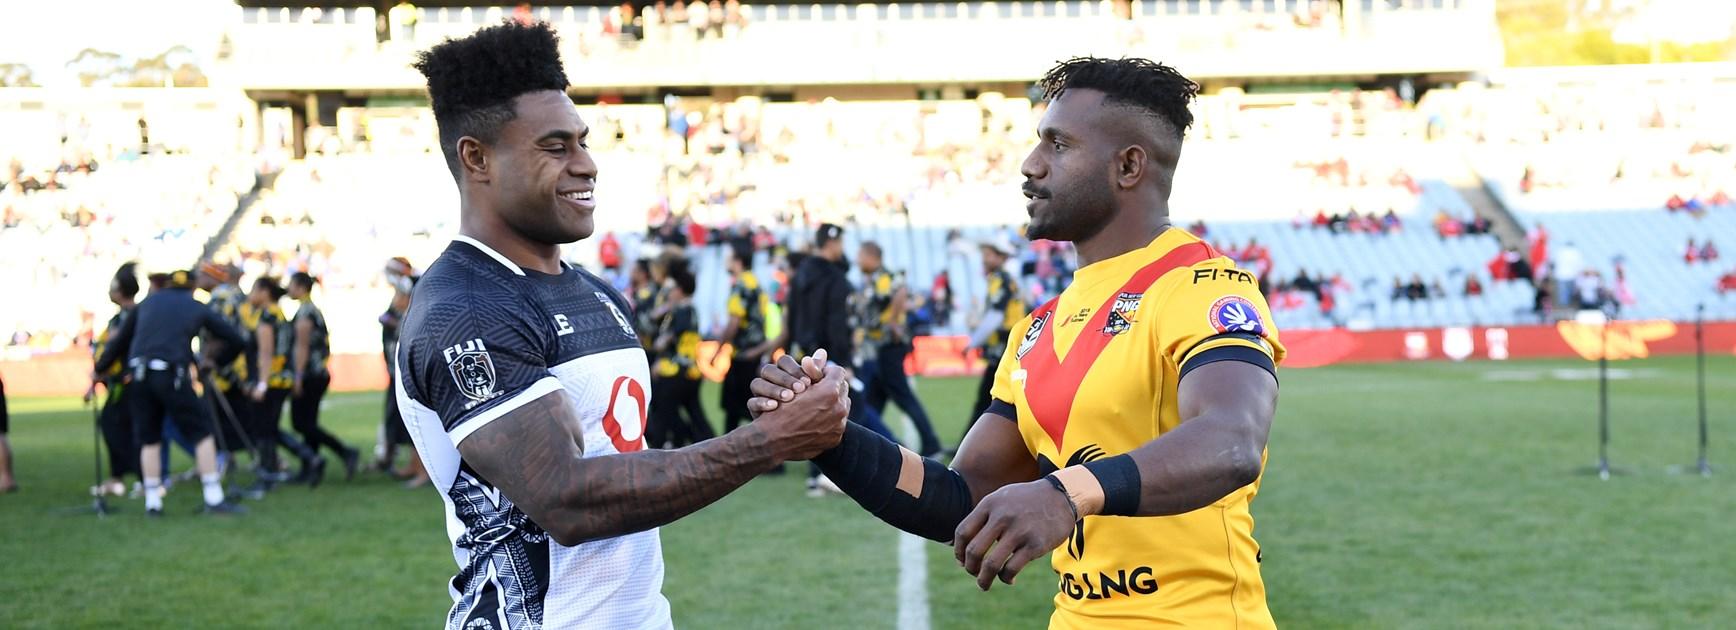 Papua New Guinea stun Fiji with first half blitz.